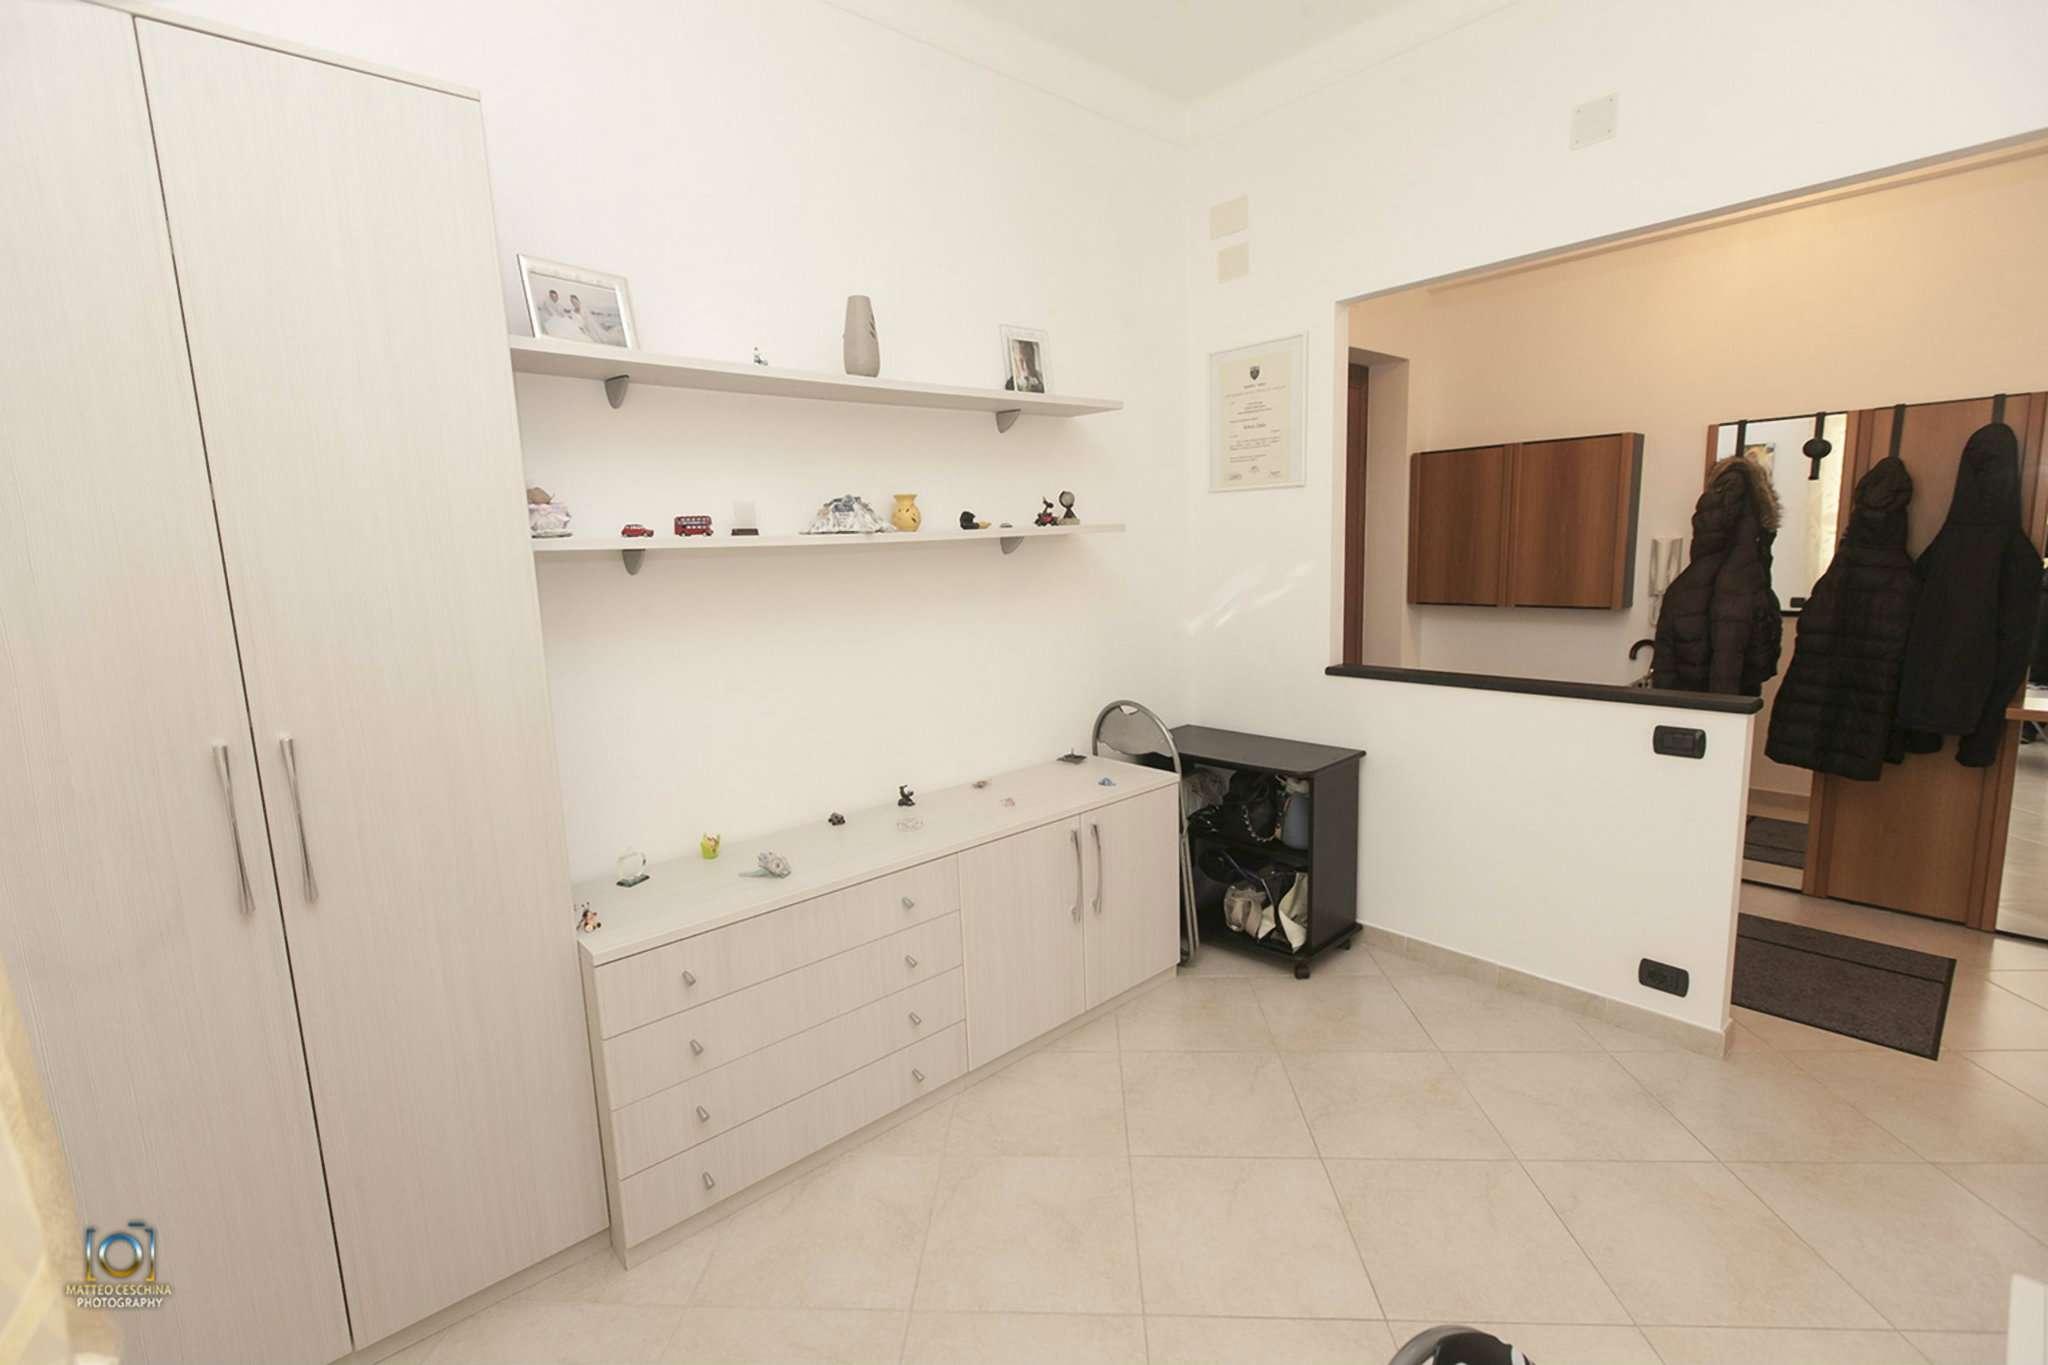 Appartamento genova vendita zona 11 for Cucina 9 genova